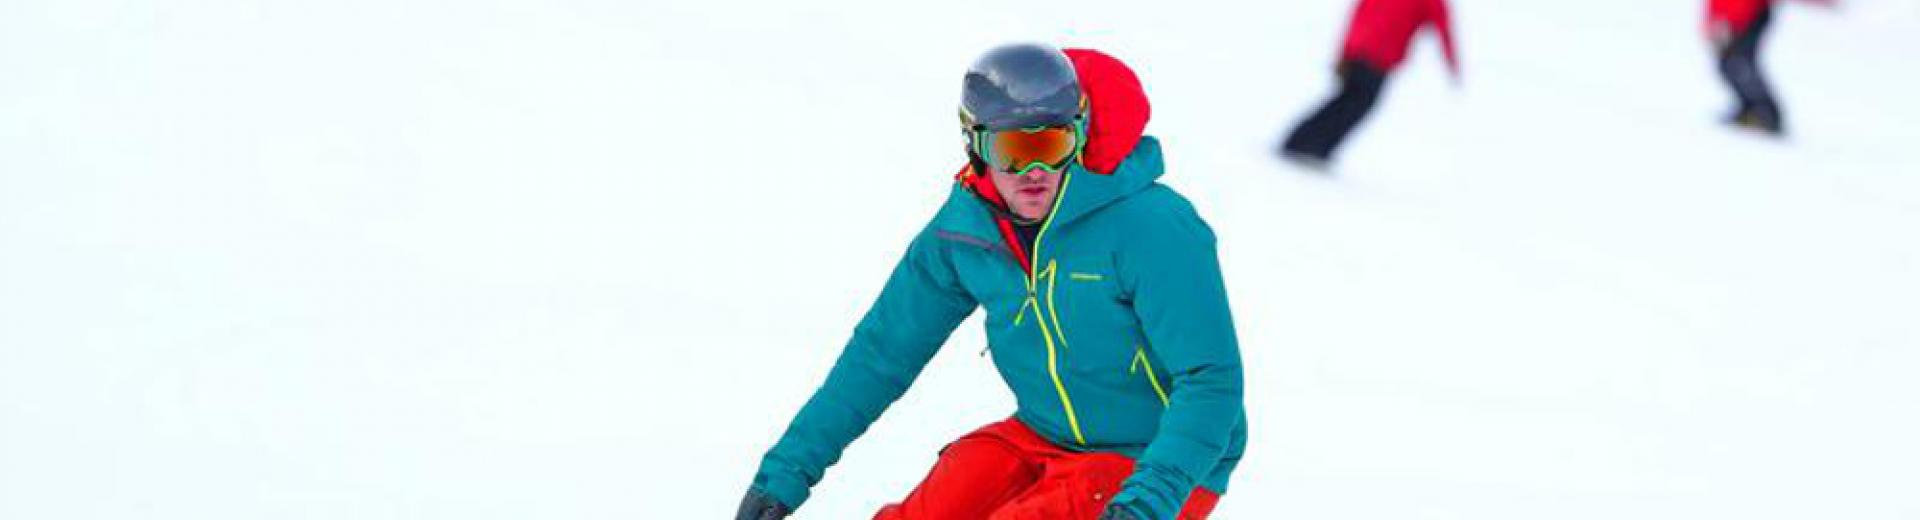 colorado ski